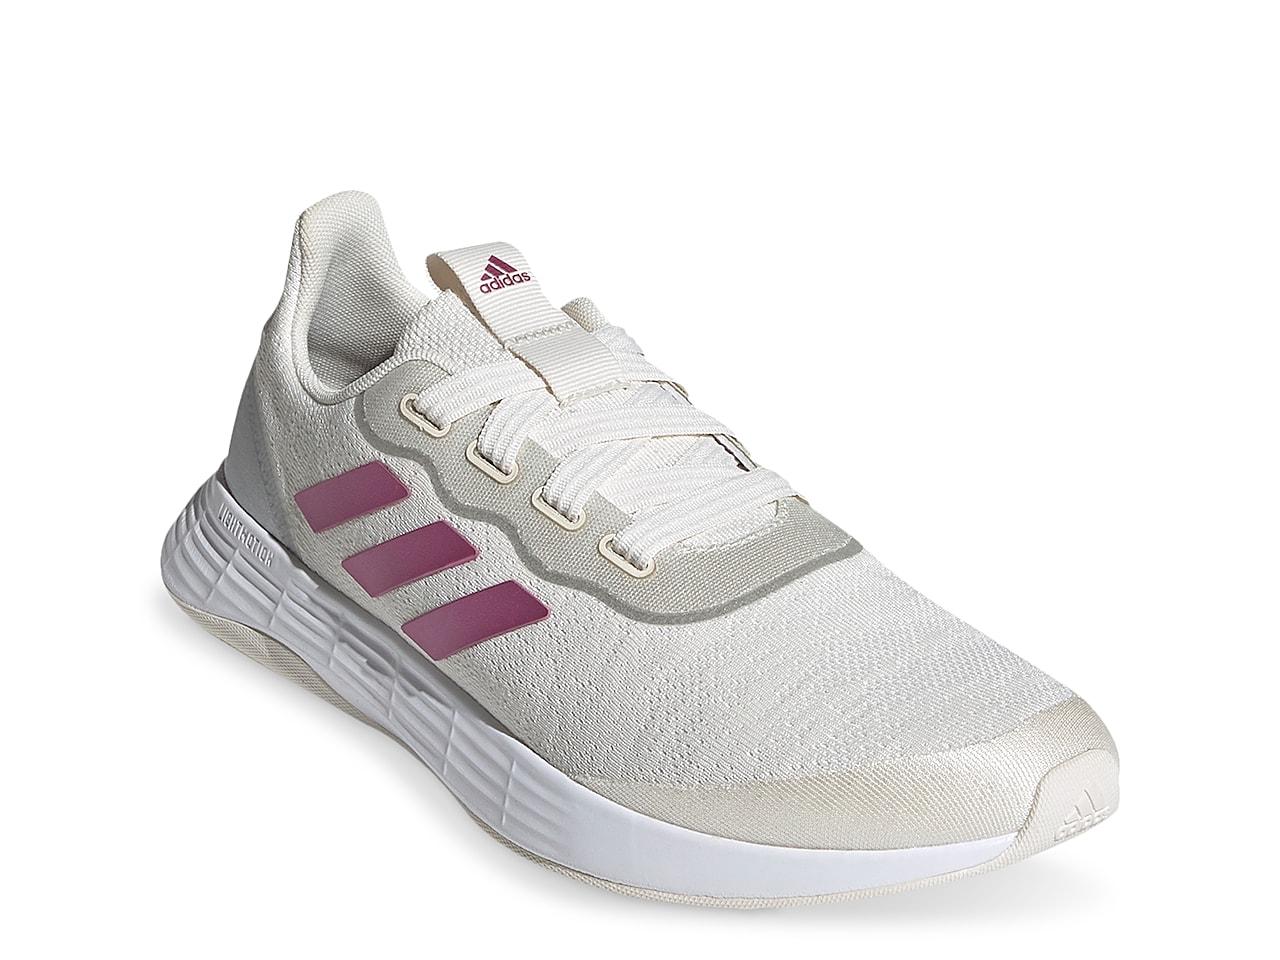 adidas QT Racer Sport Sneaker - Women's